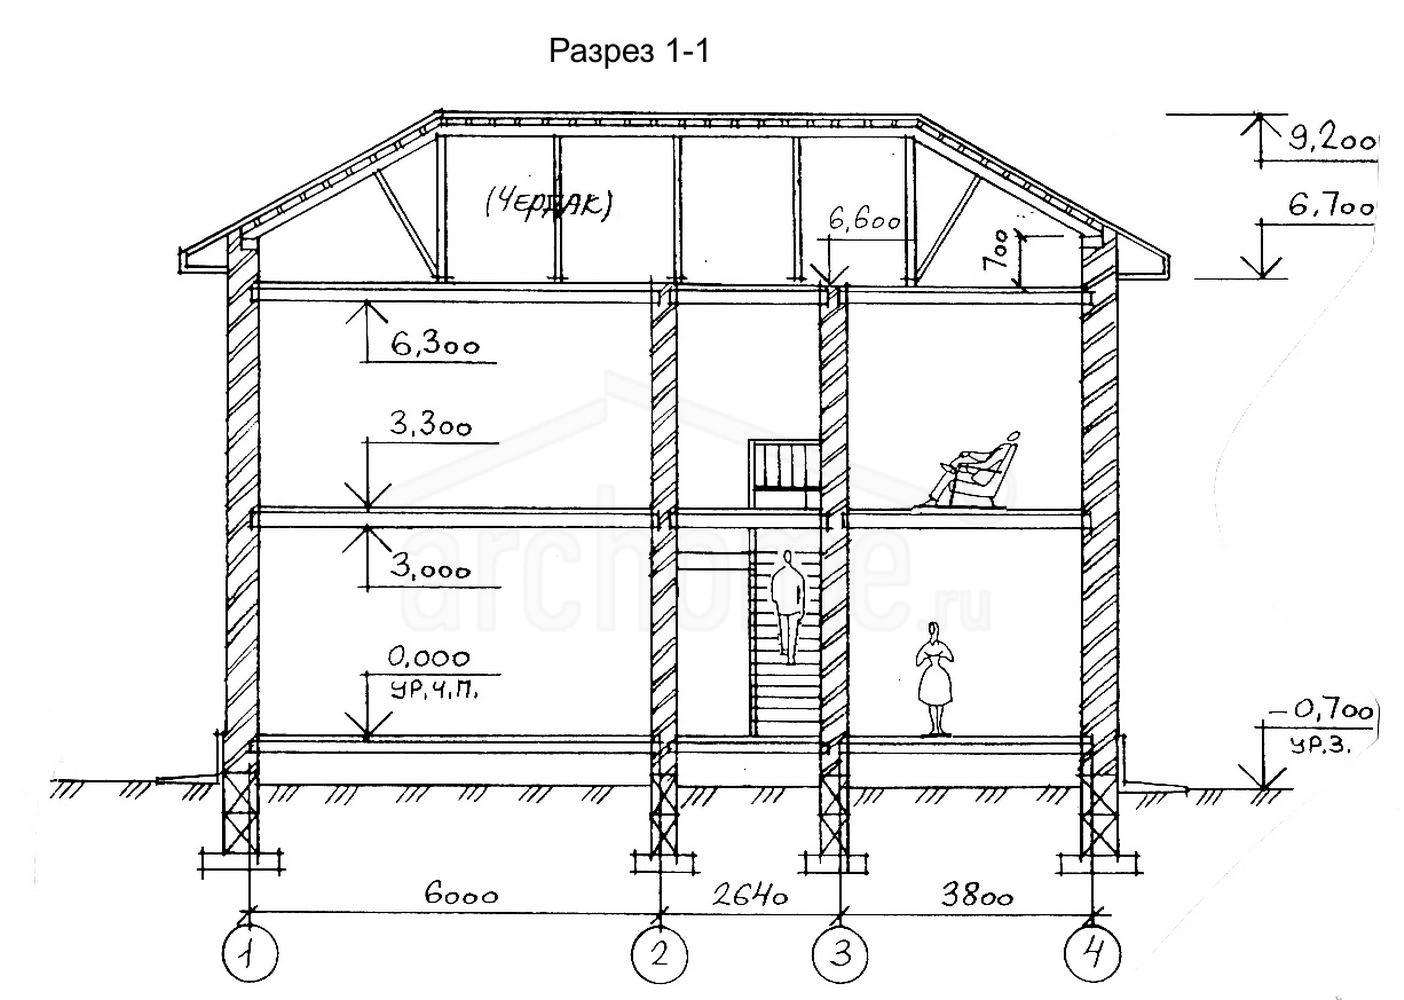 Планы этажей проекта ВАТСОН 3